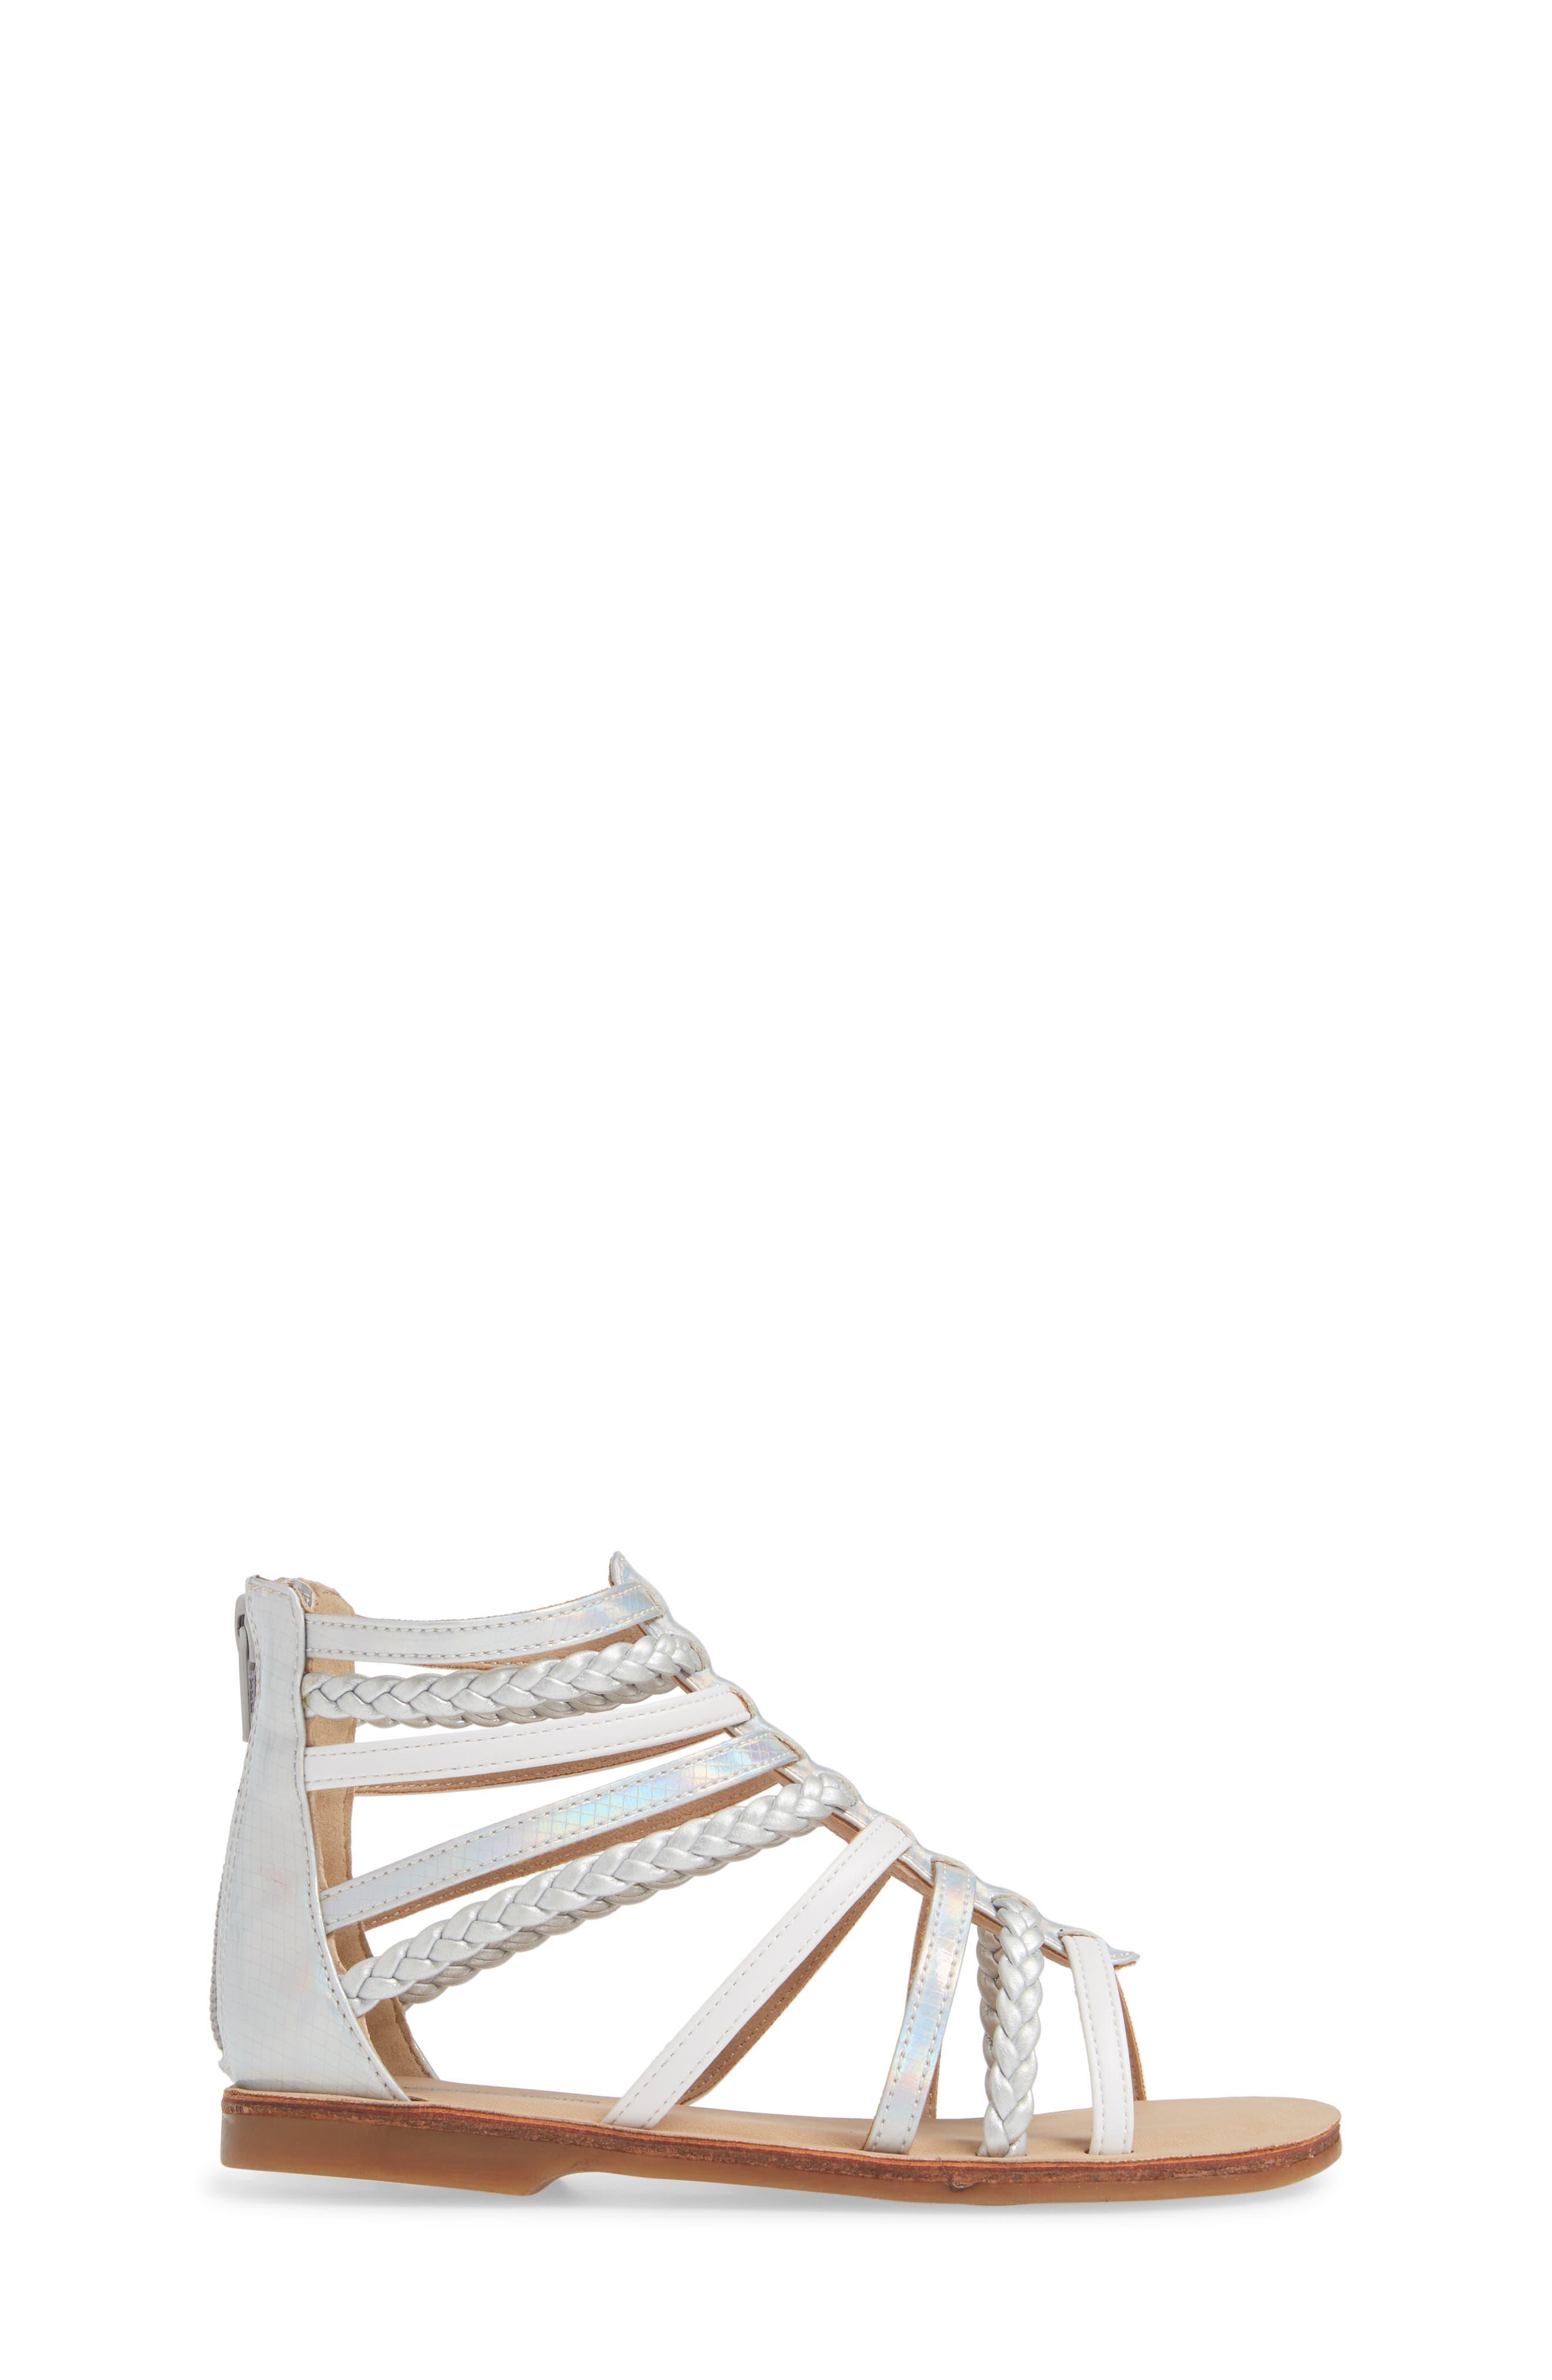 TUCKER + TATE, Sonja Braided Gladiator Sandal, Alternate thumbnail 3, color, WHITE/SILVER FAUX LEATHER